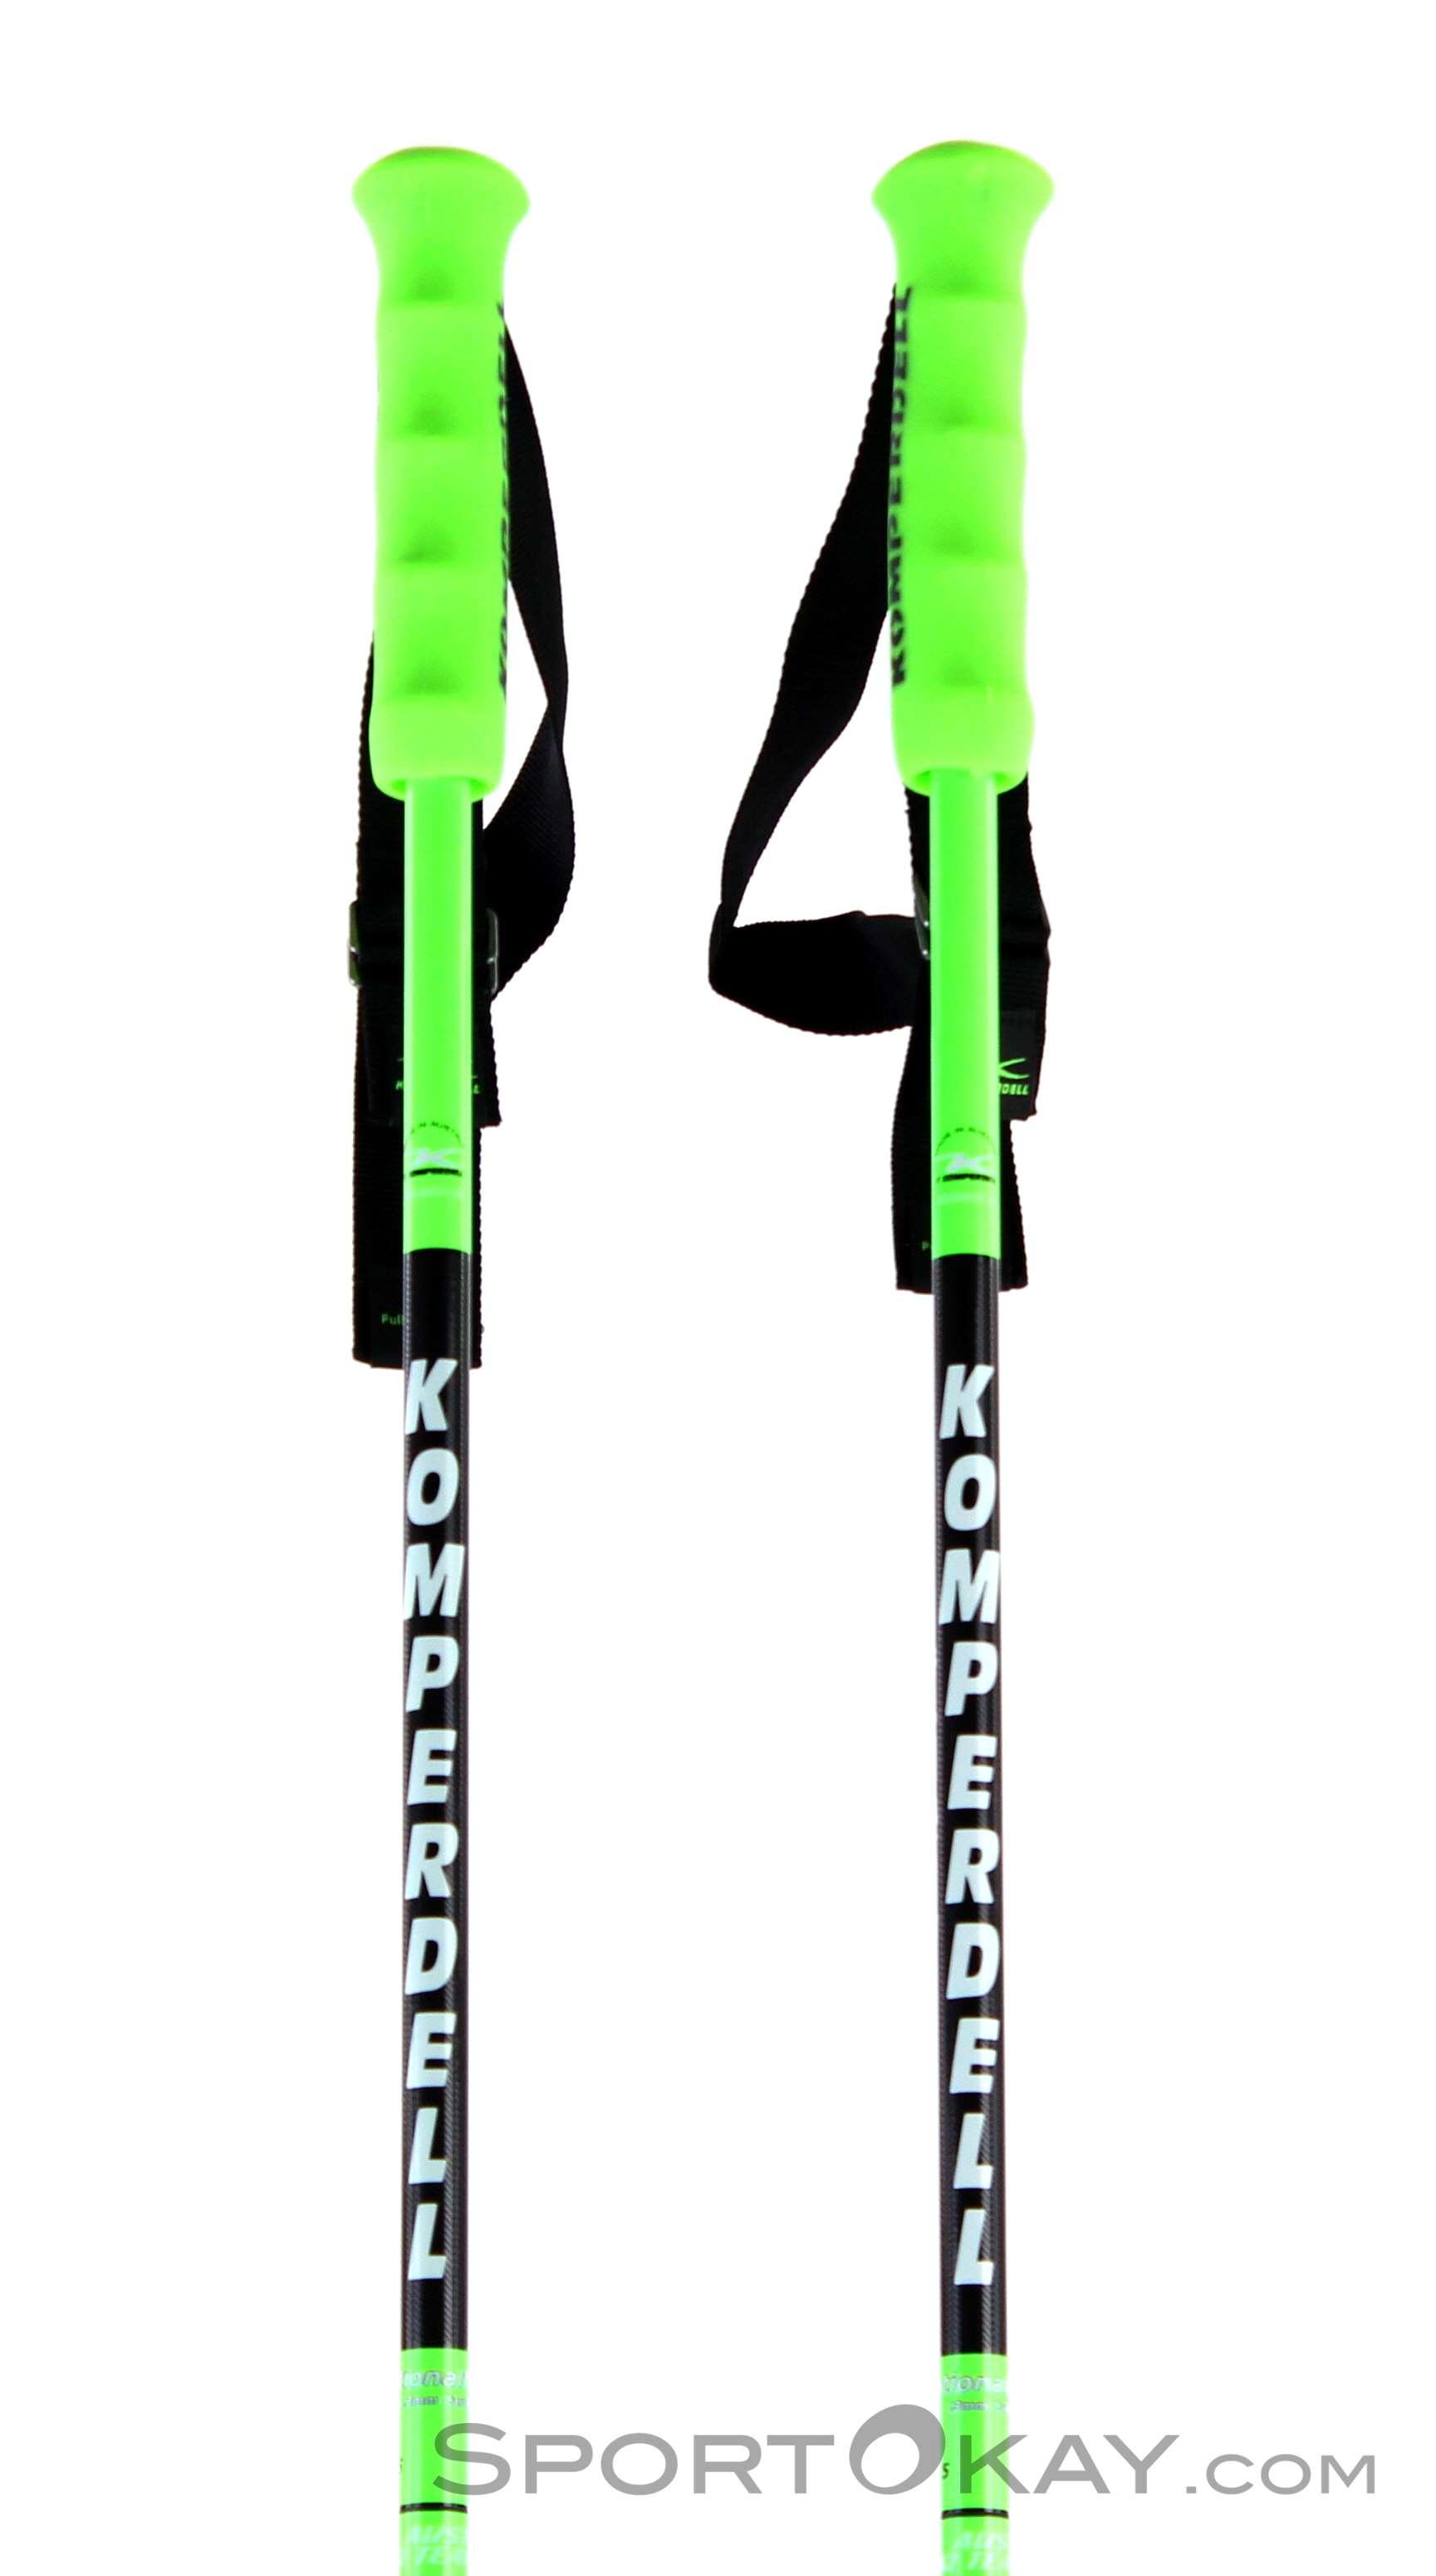 Komperdell Nationalteam Carbon Skistöcke-Grün-120